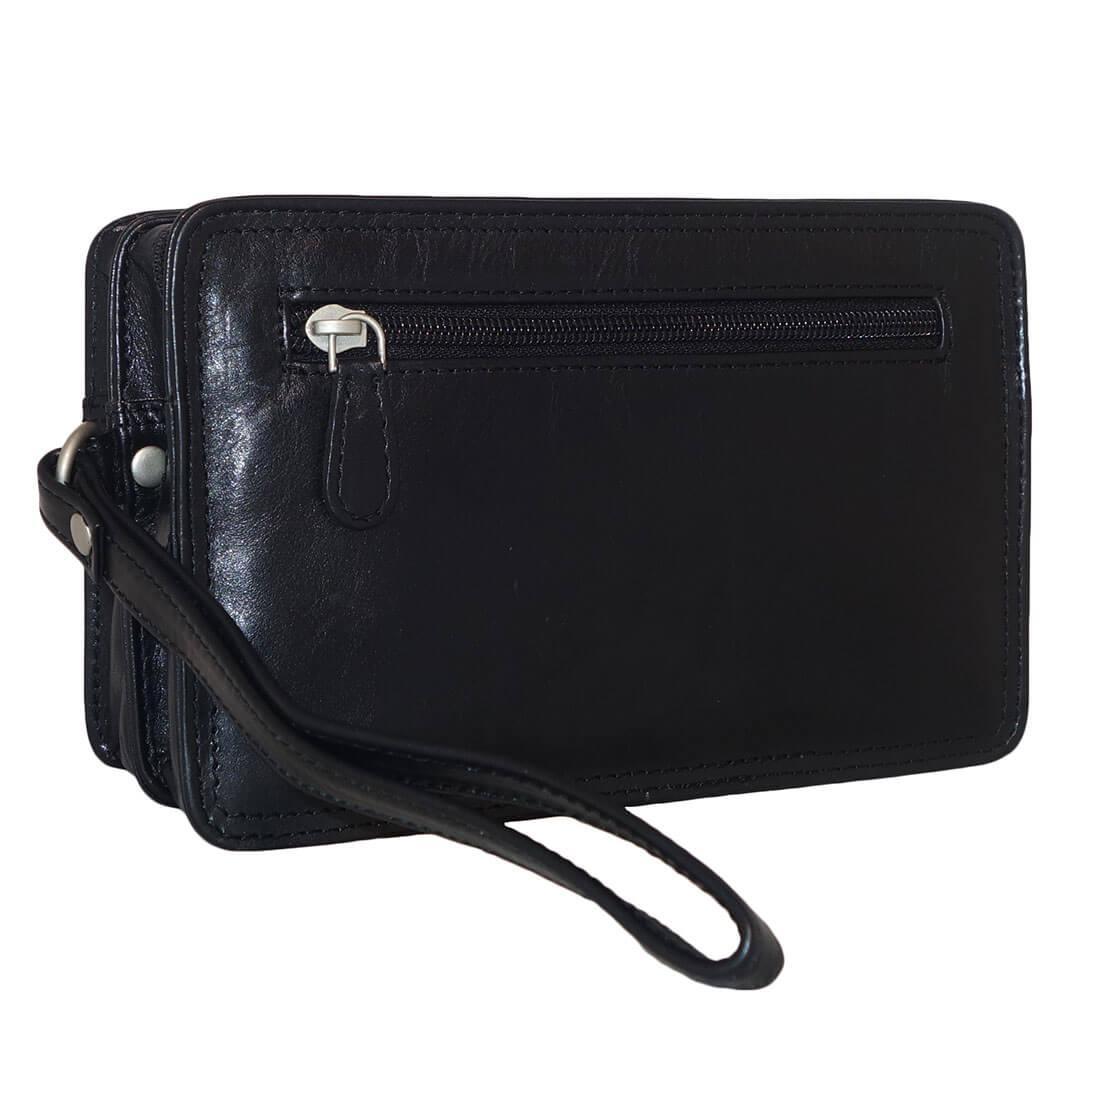 Leather Design Leren Polstas Zwart 4 Vaks-0